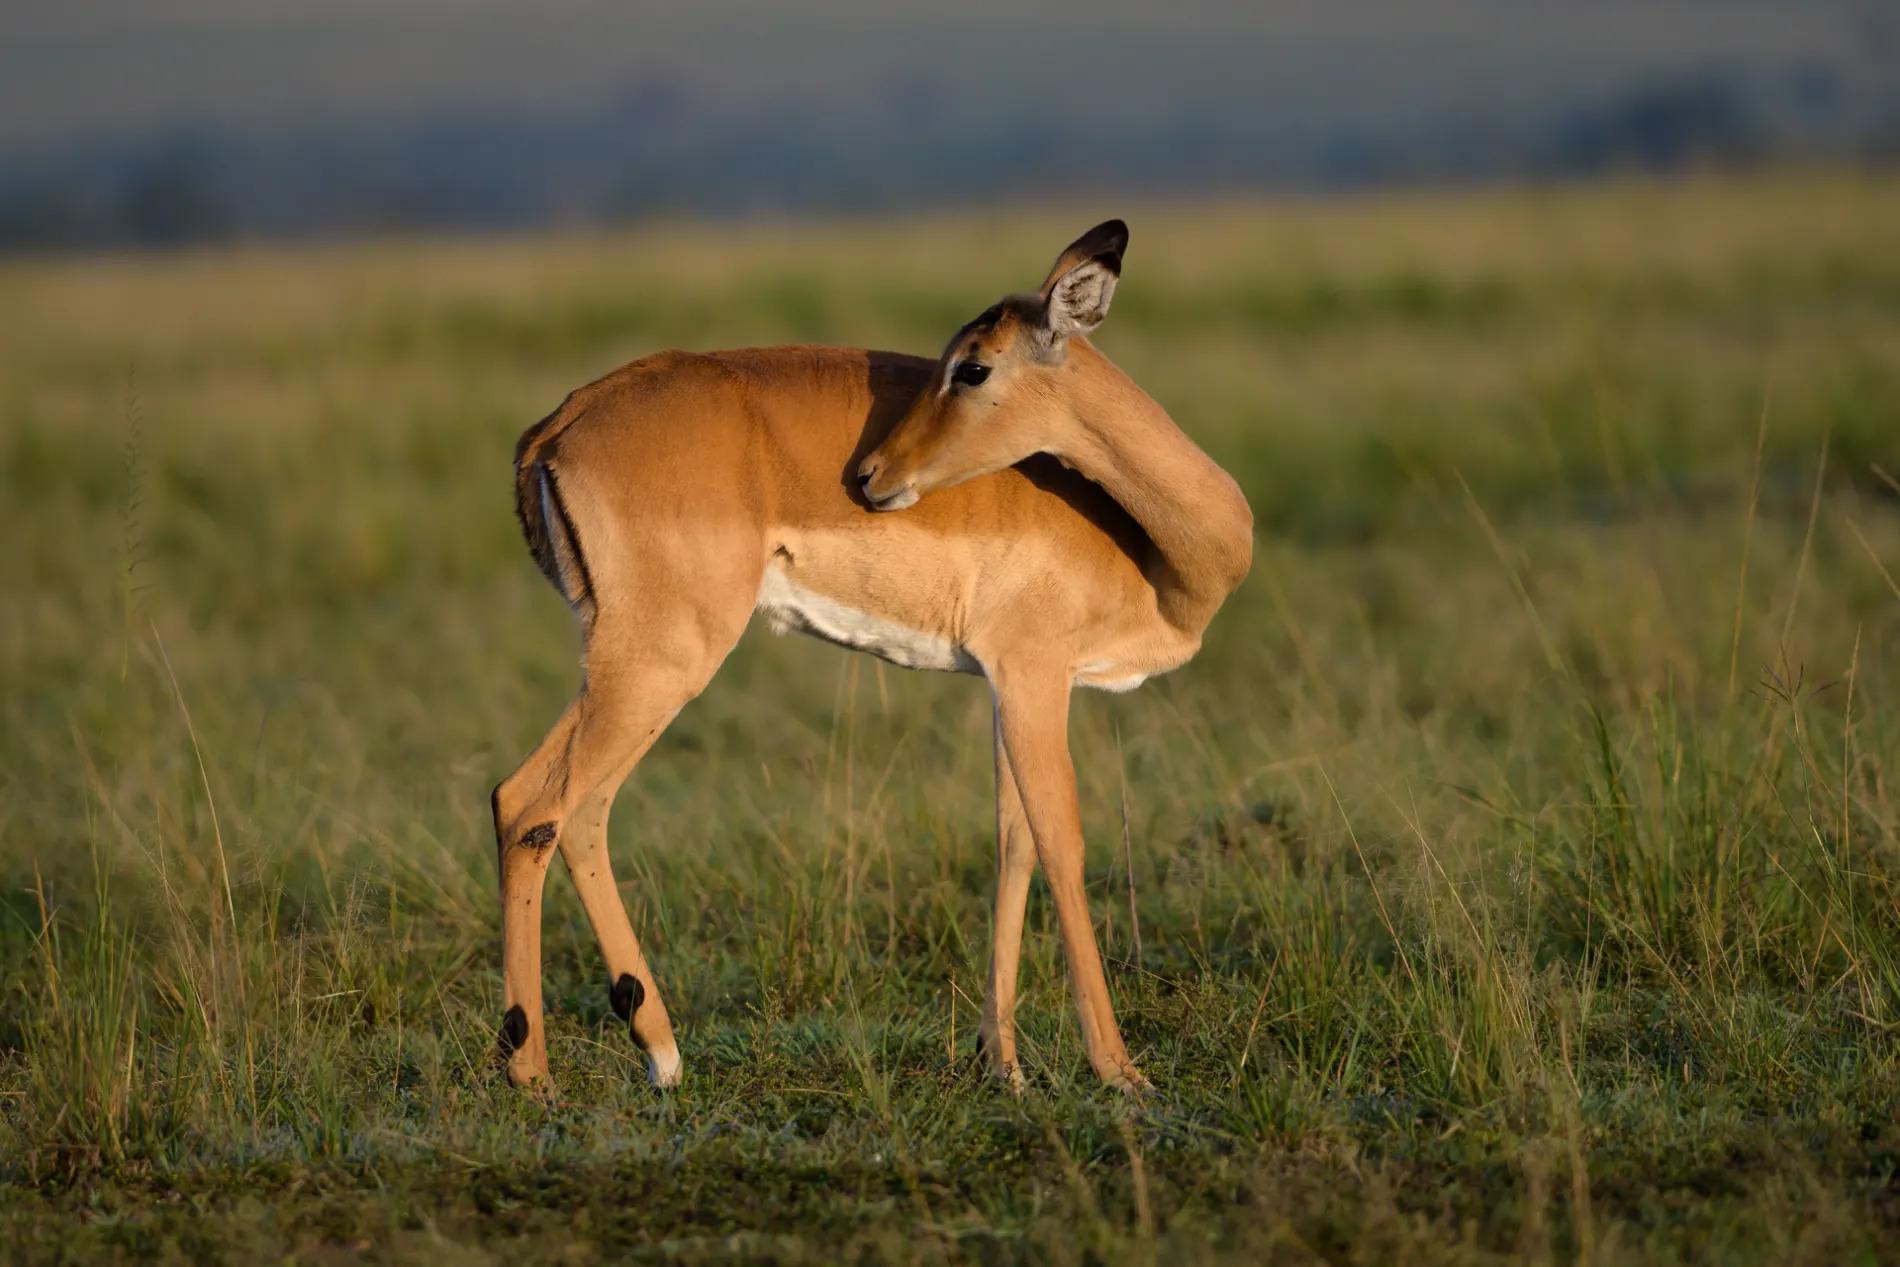 Impala grooming